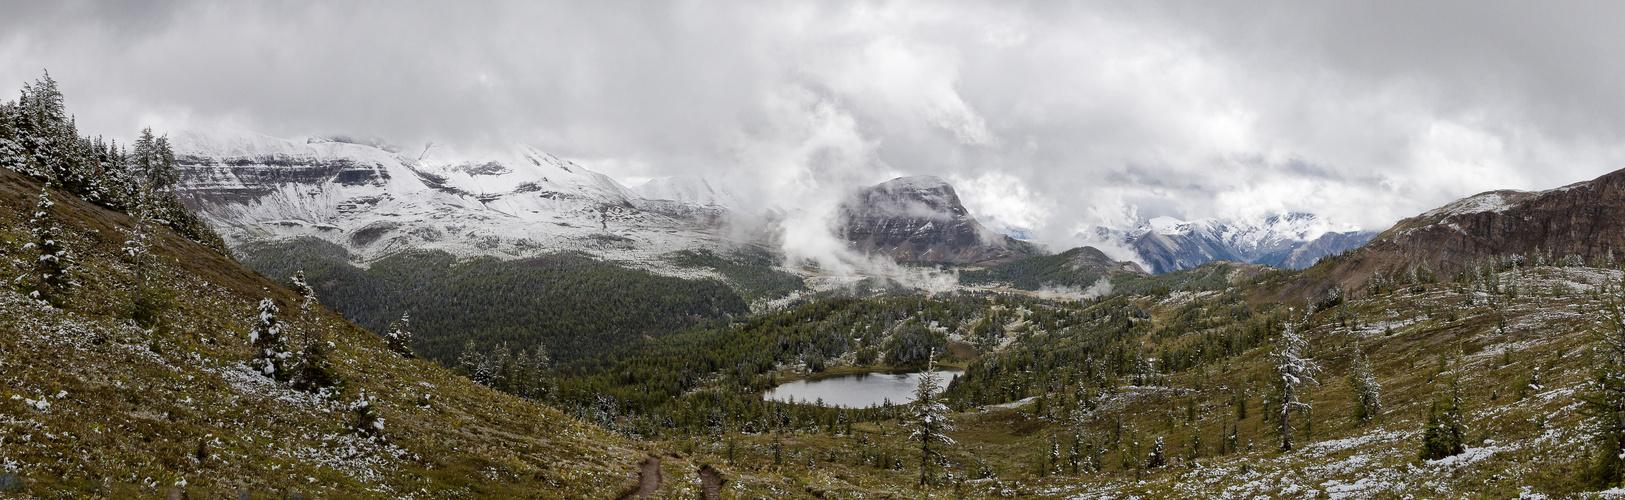 Banff National Park - Sunshine Meadows